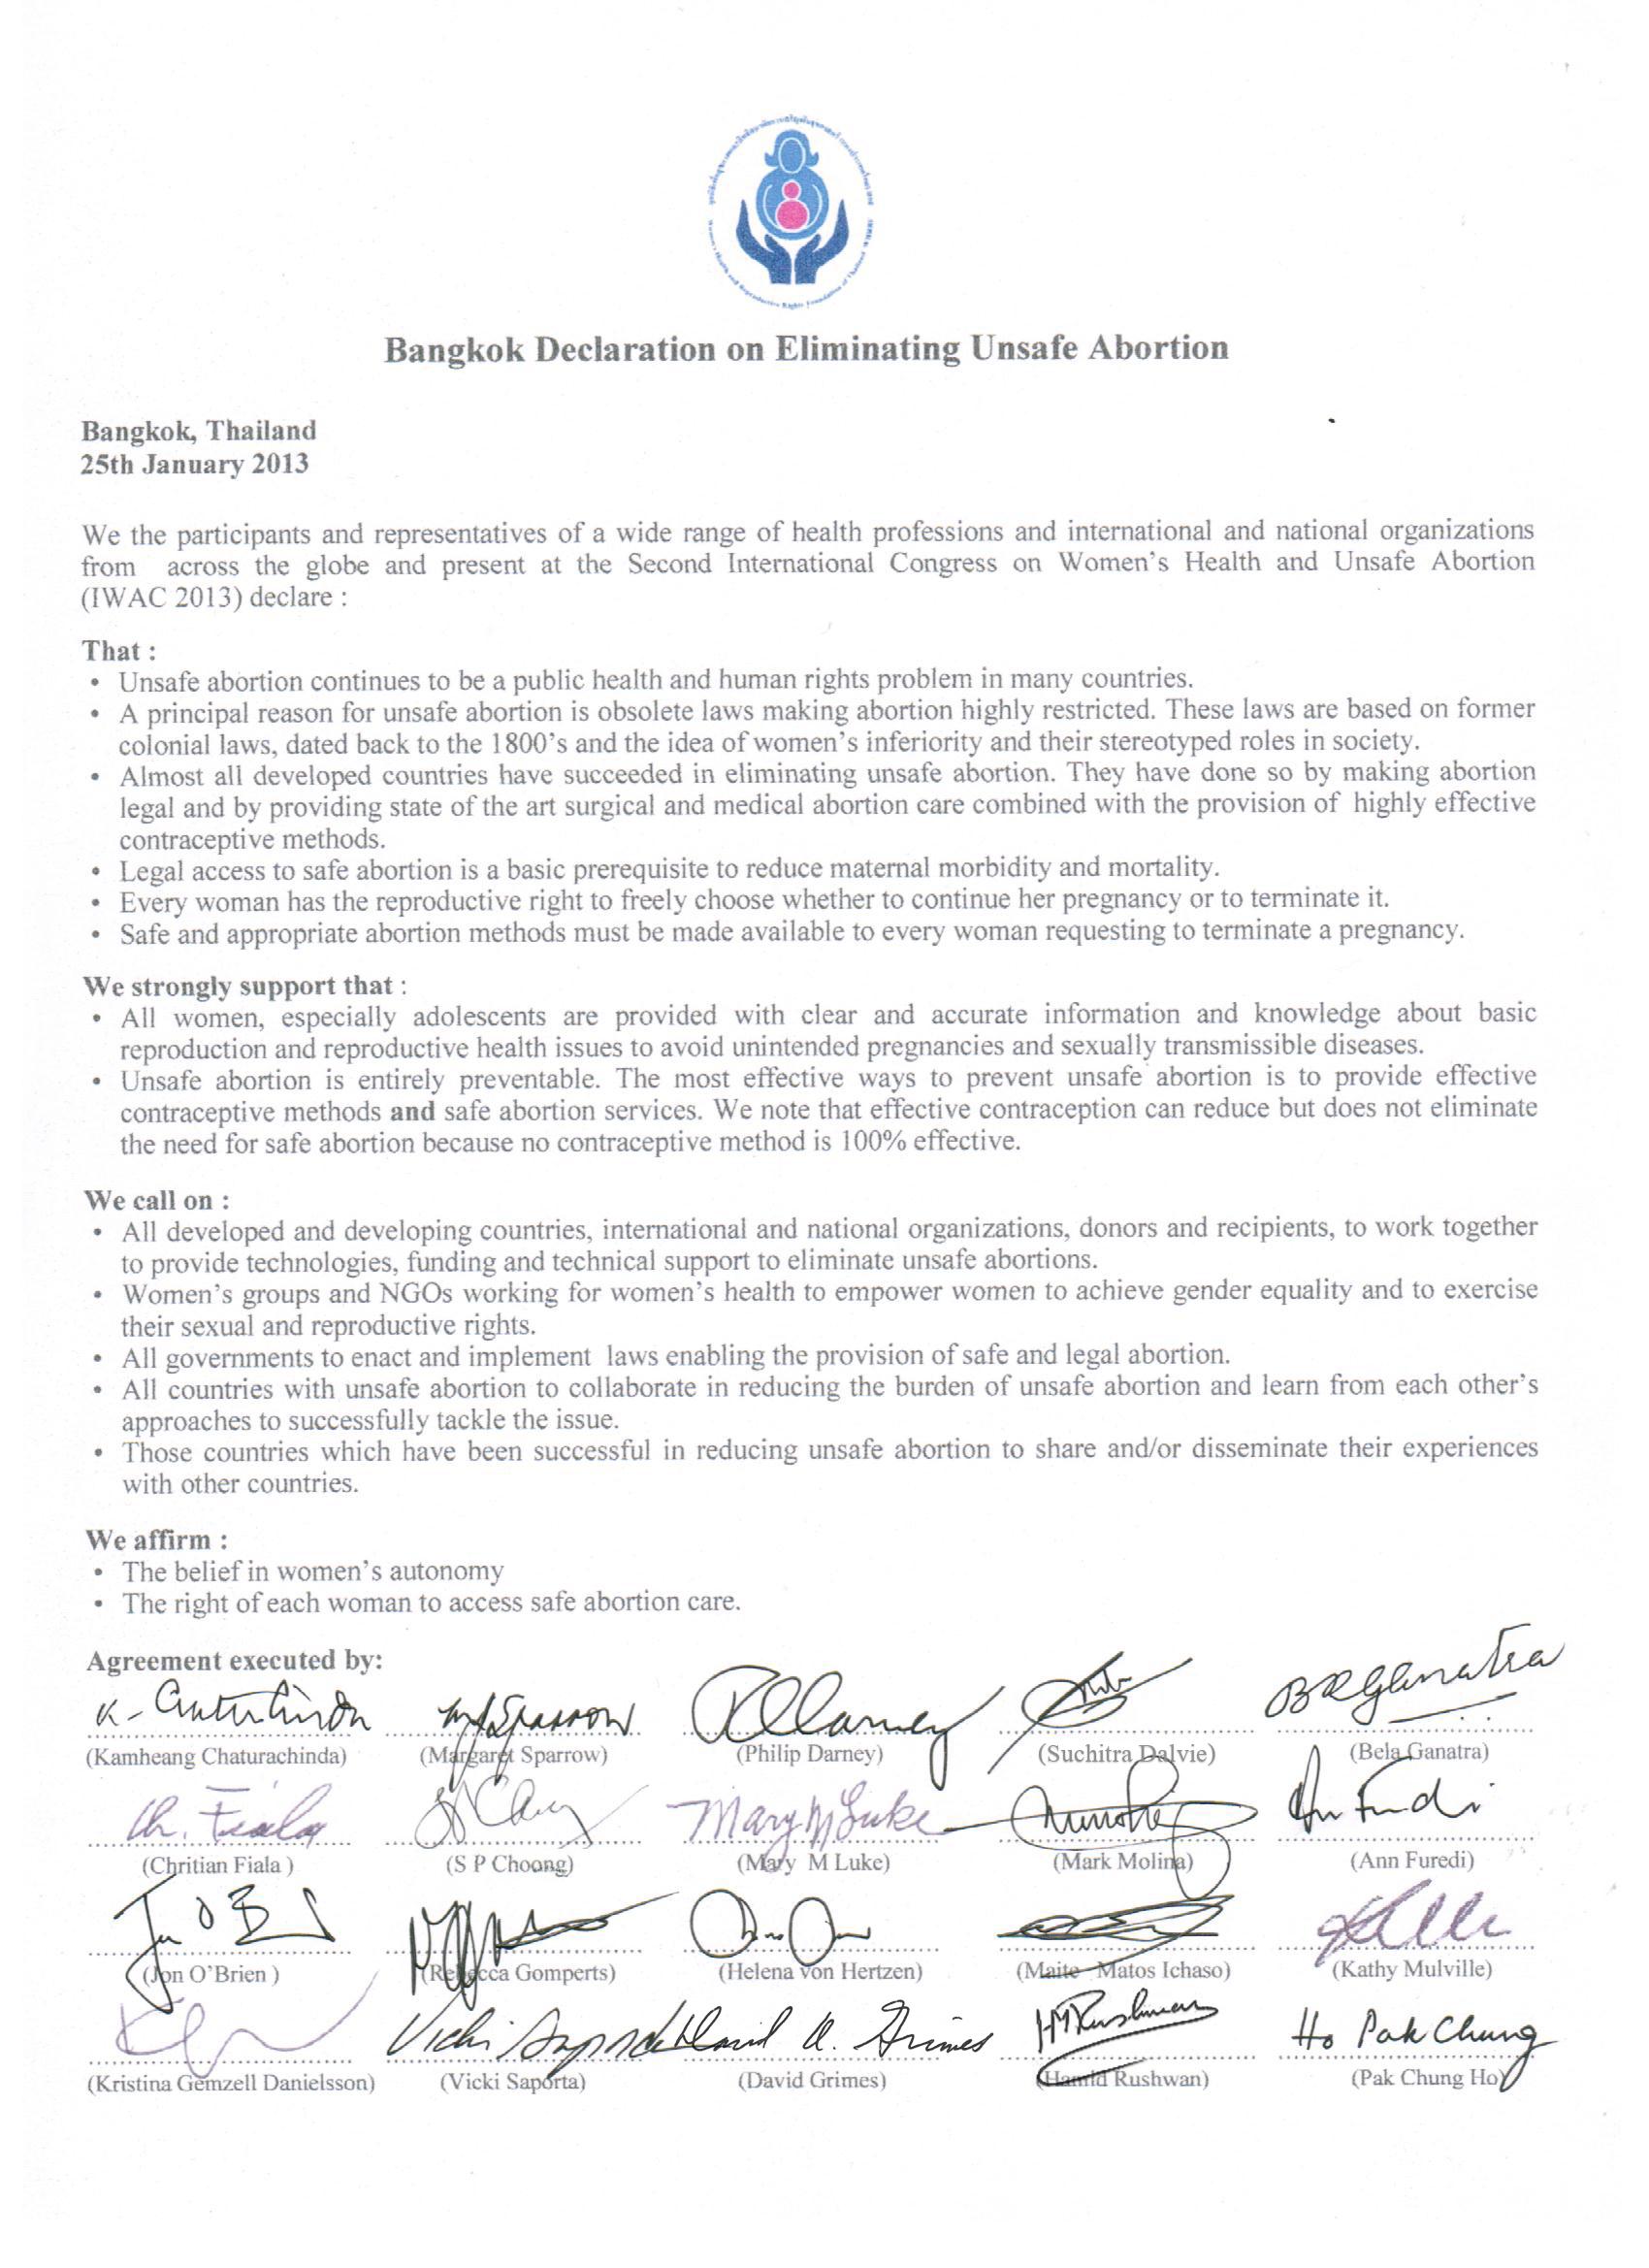 IWAC2013 Bangkok Declaration